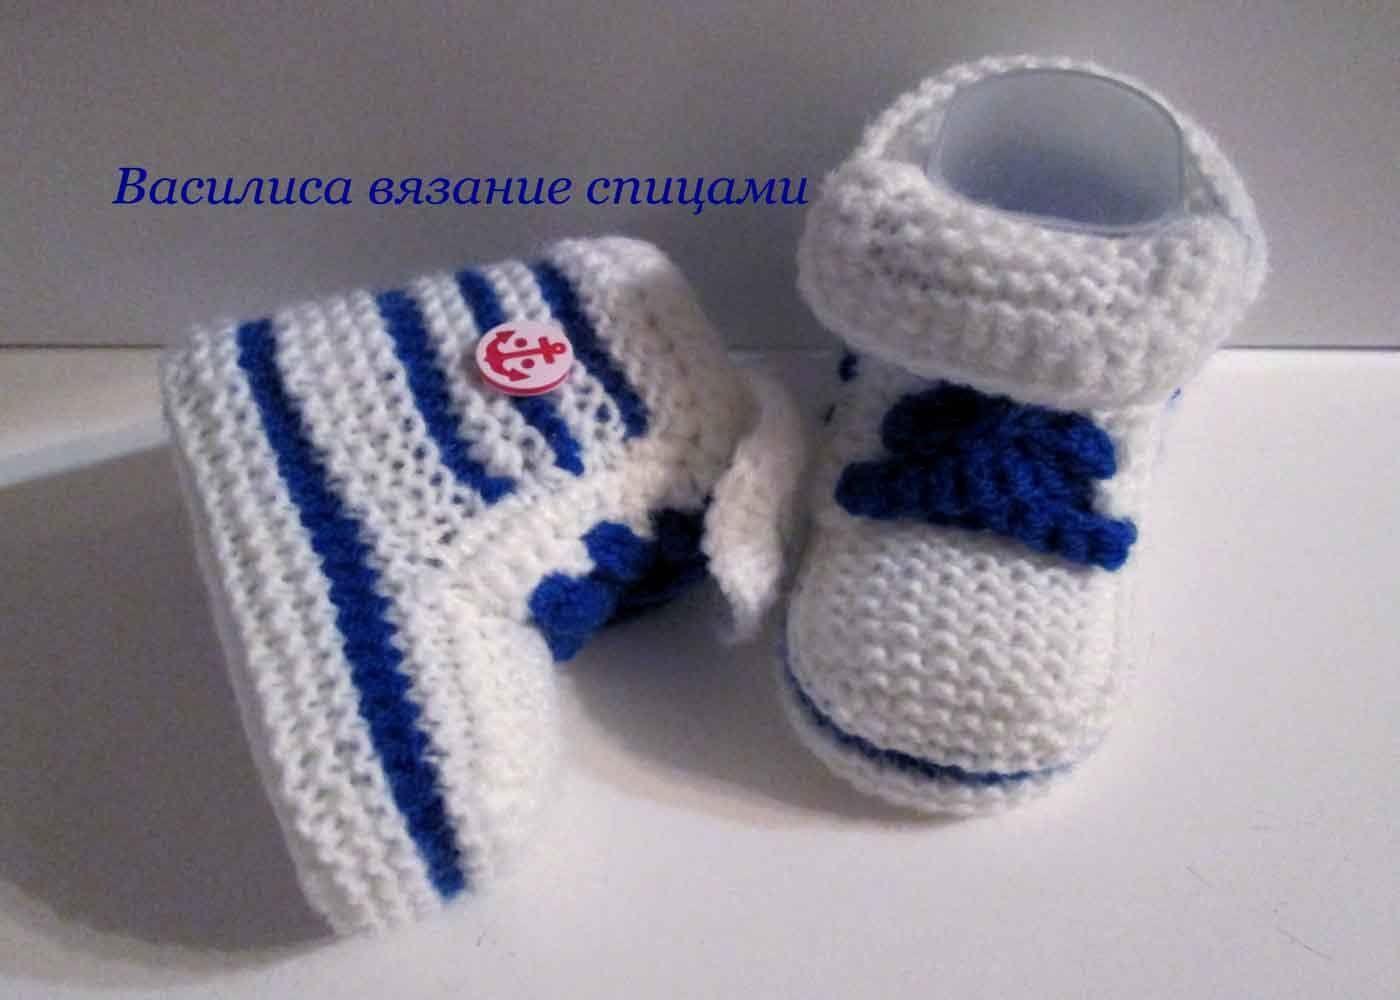 baby booties knitting for beginners #baby_booties #sneakers | DIY ...